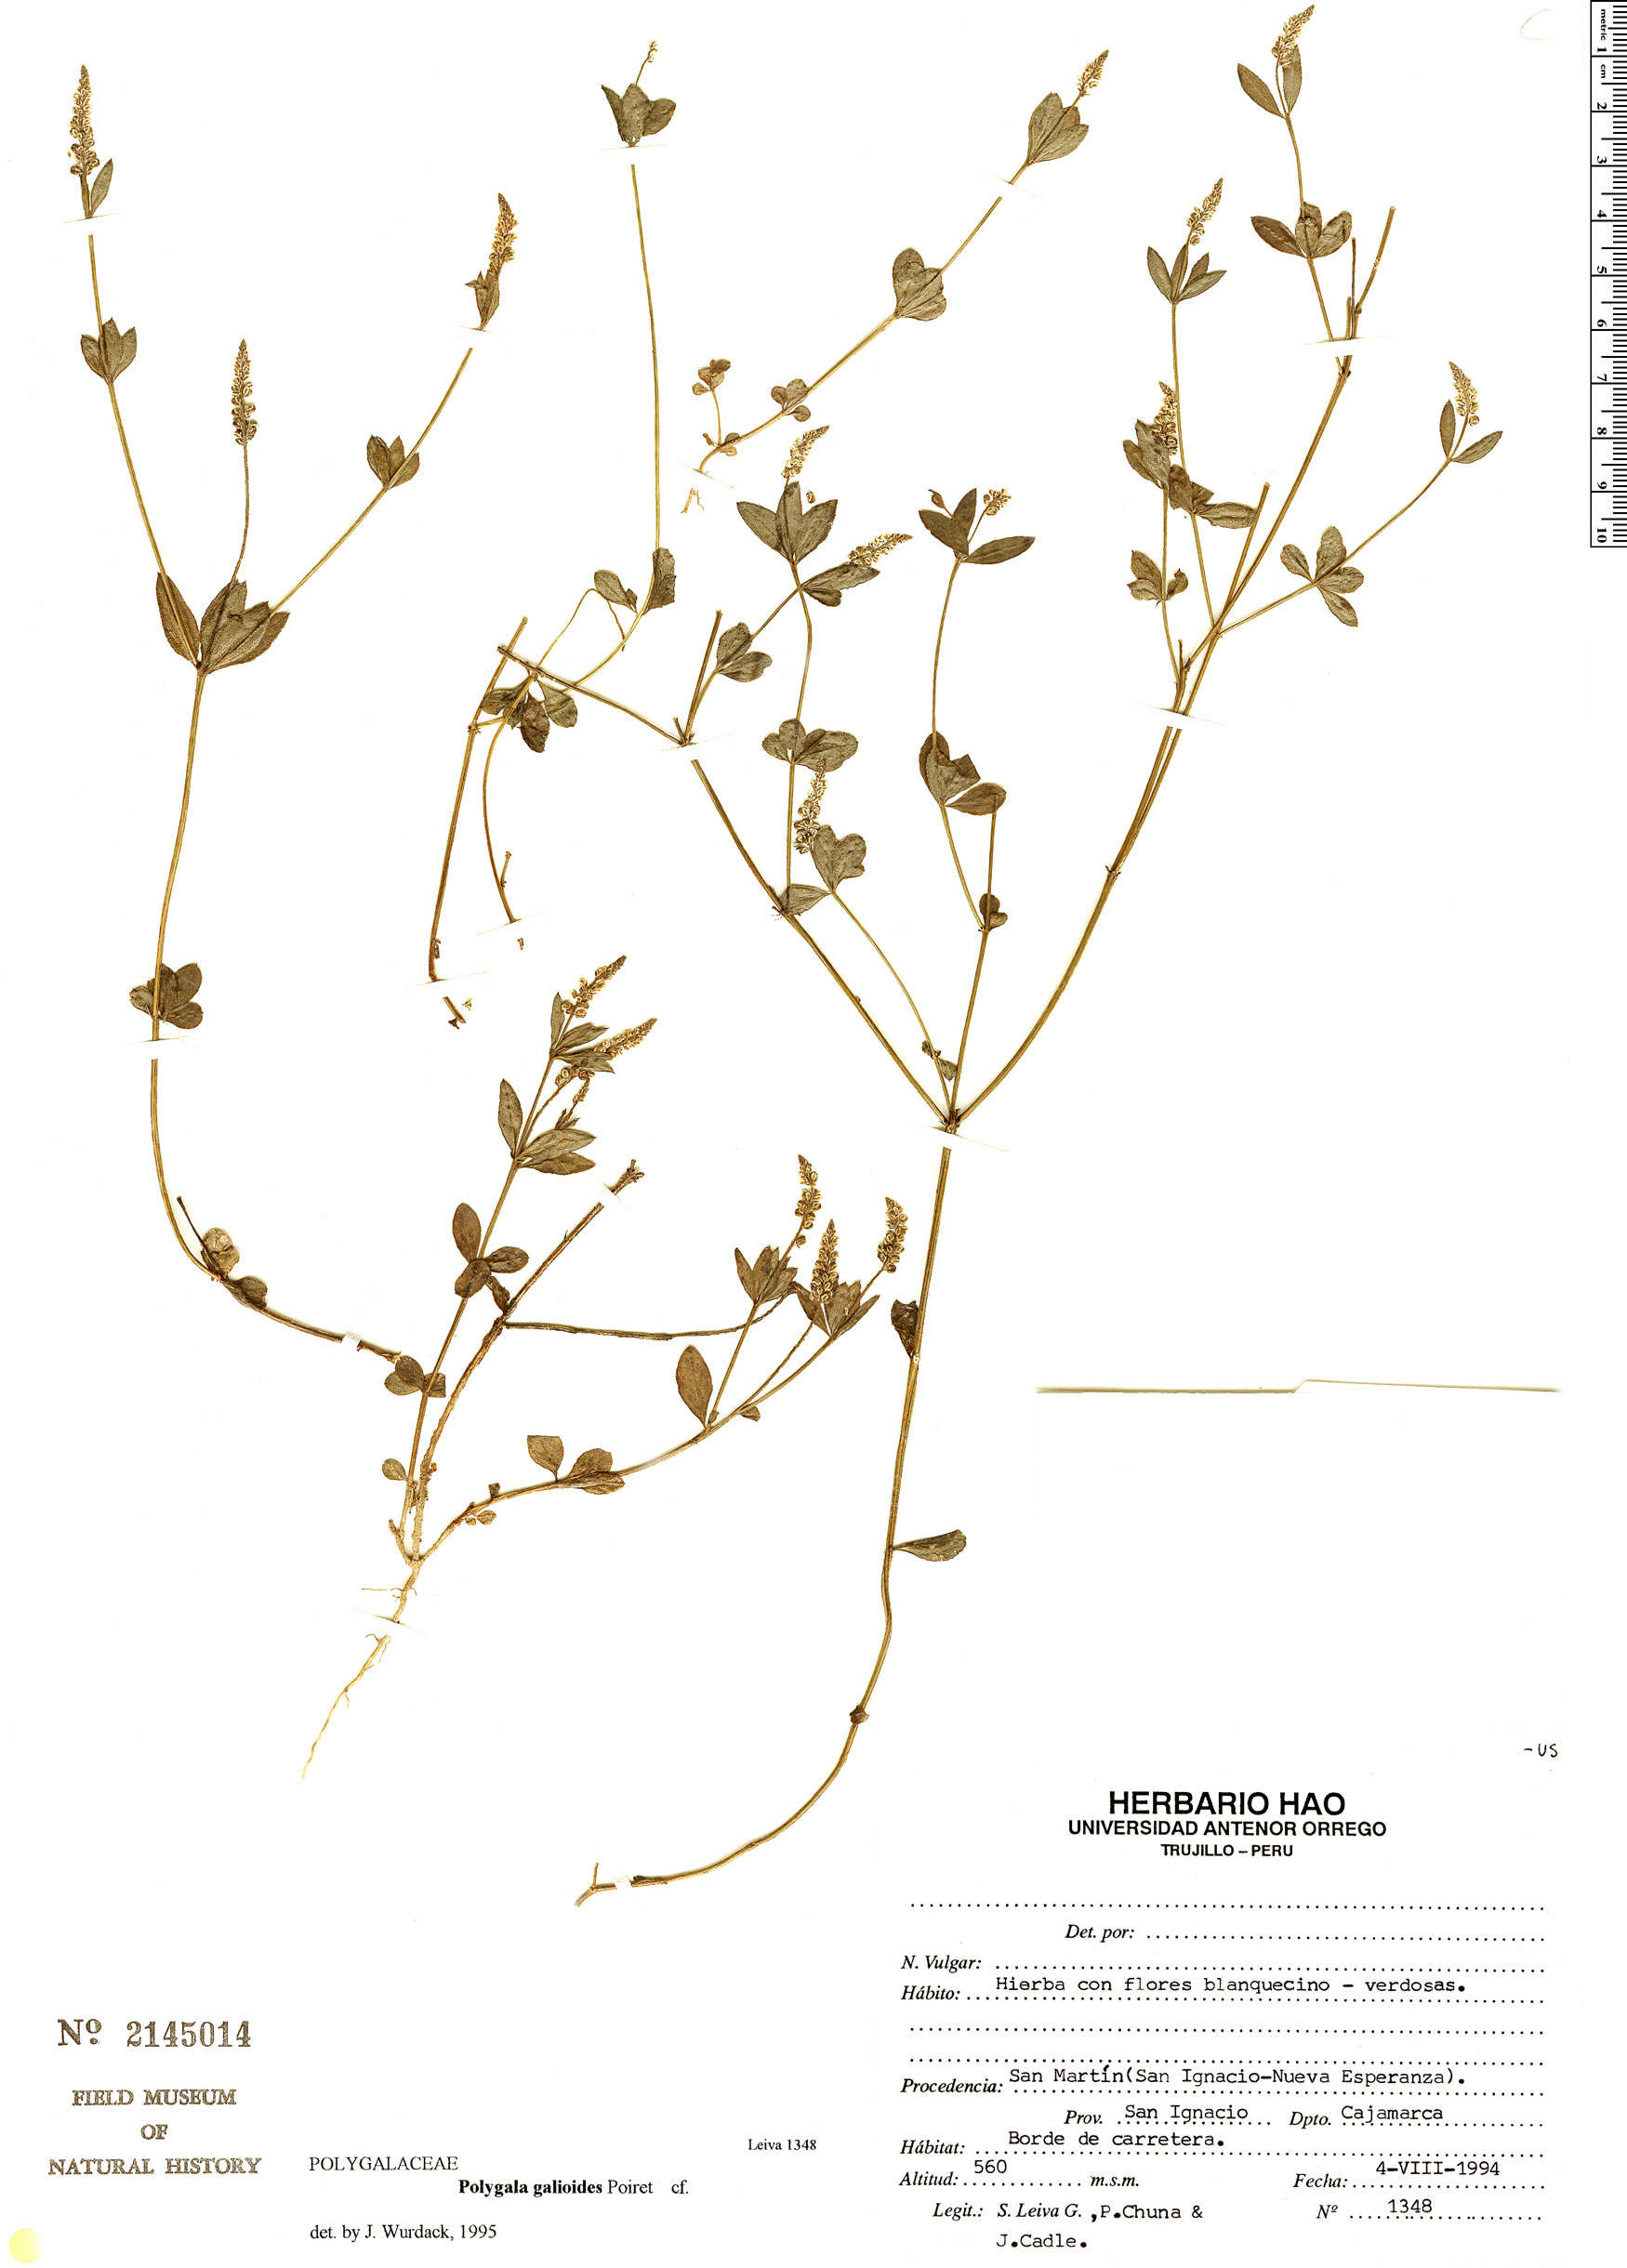 Specimen: Polygala galioides